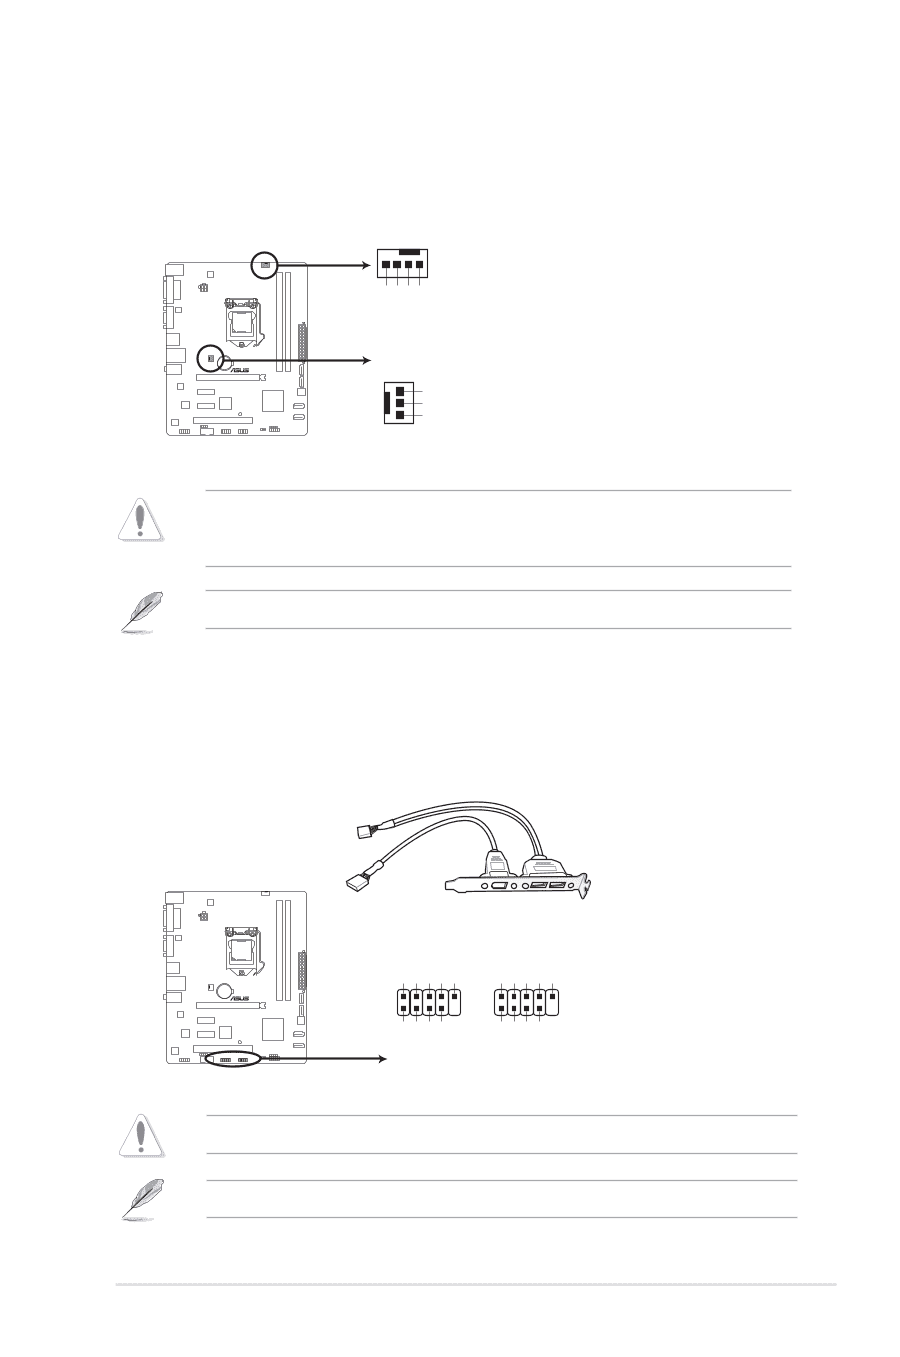 Asus P8H61-M LX2 | User Manual - Page 29